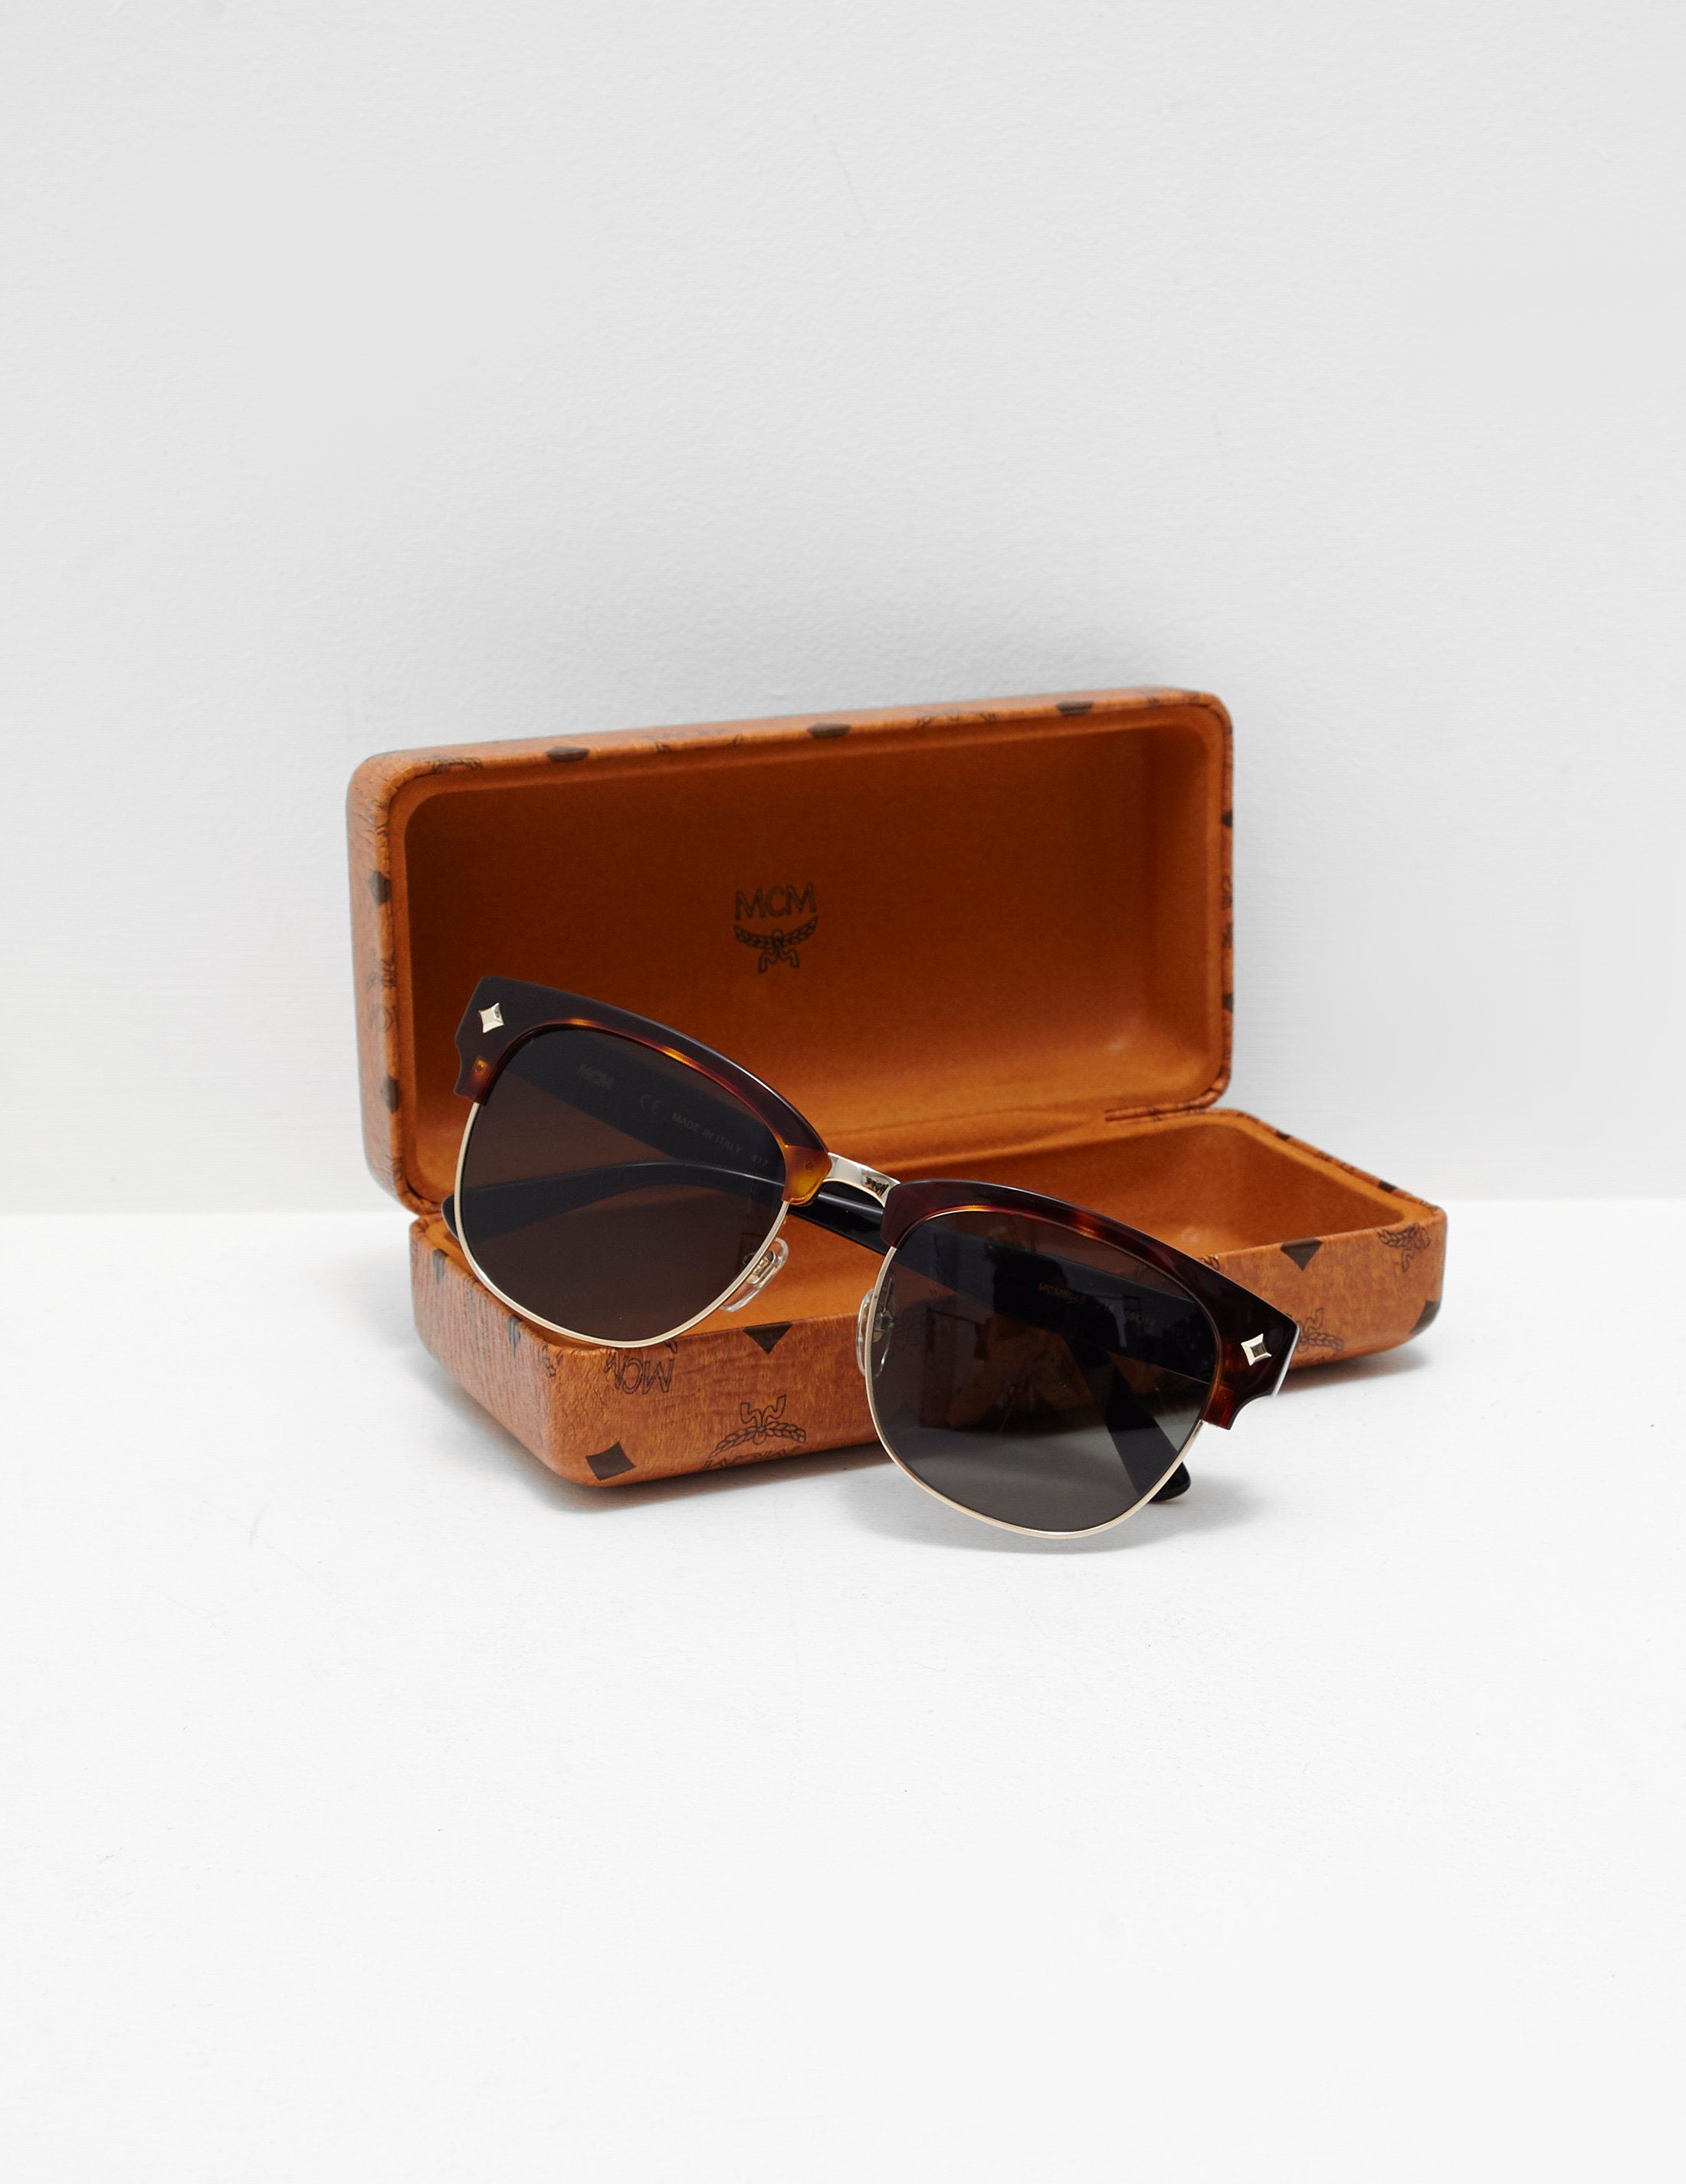 MCM Club M Sunglasses - Online Exclusive